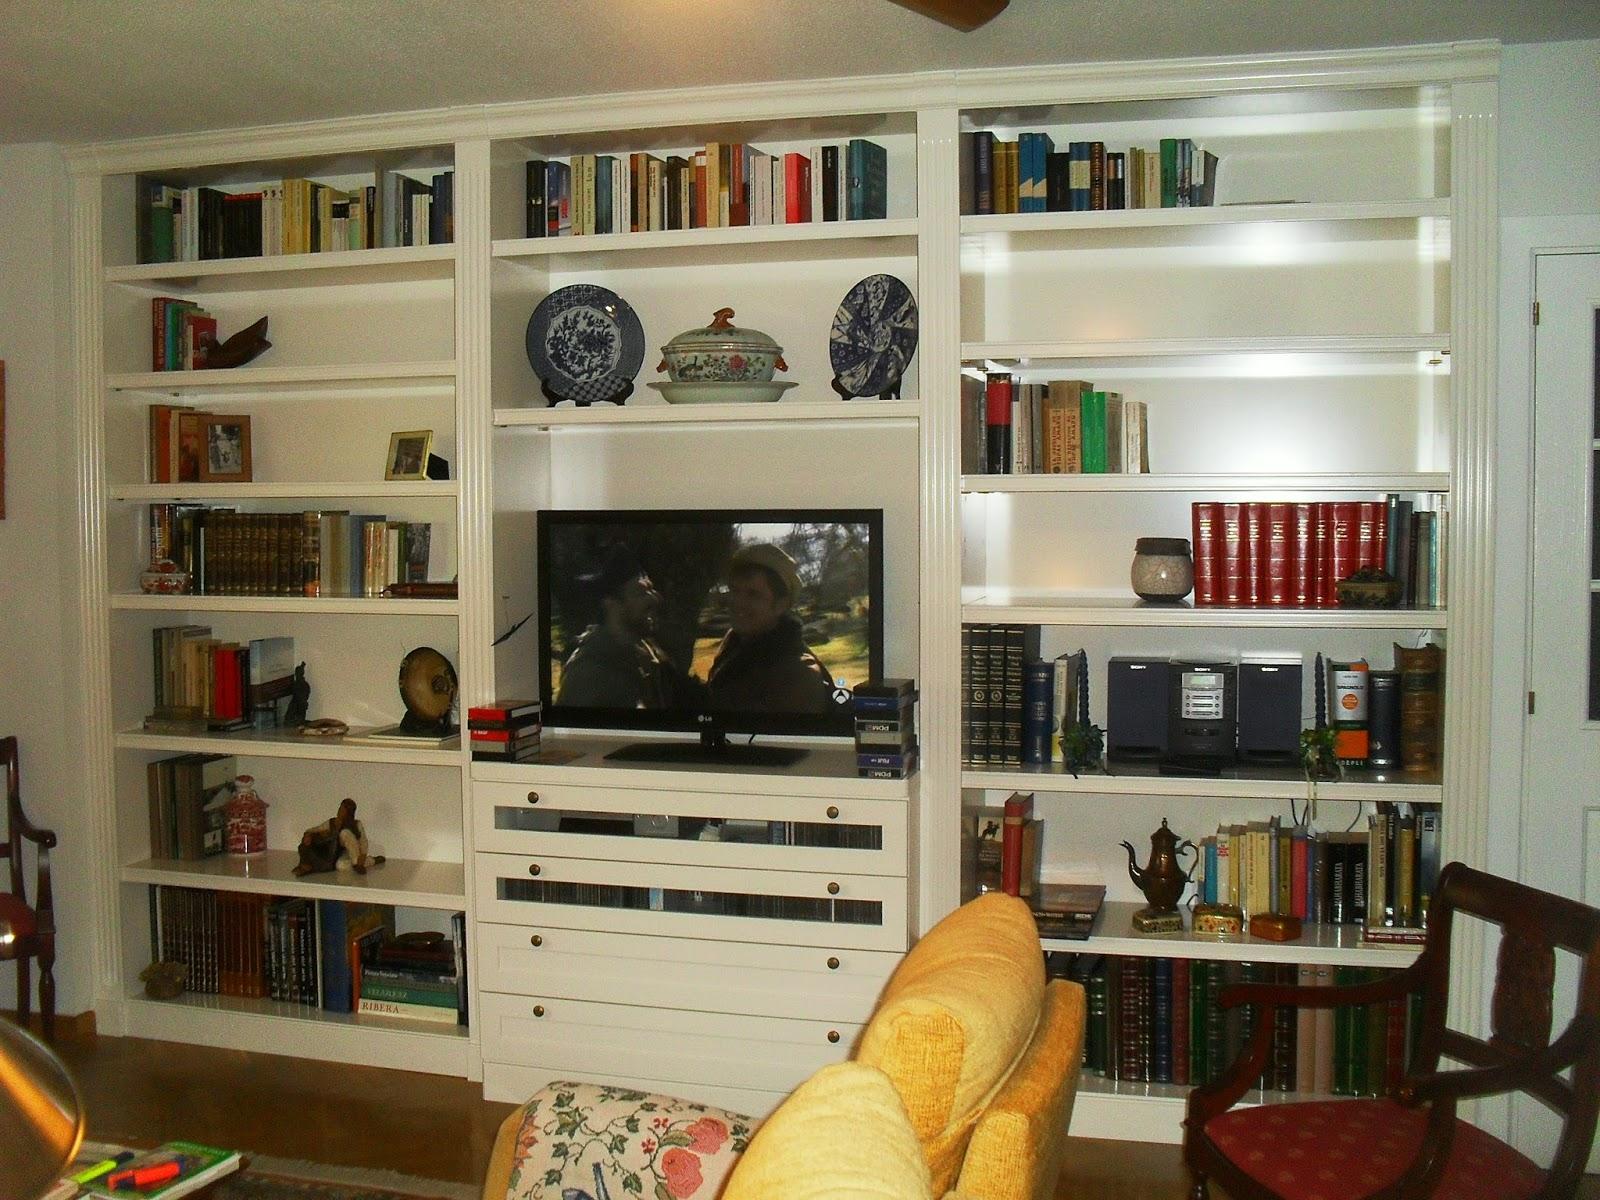 libreria a medida madrid mueble a medida 617075183